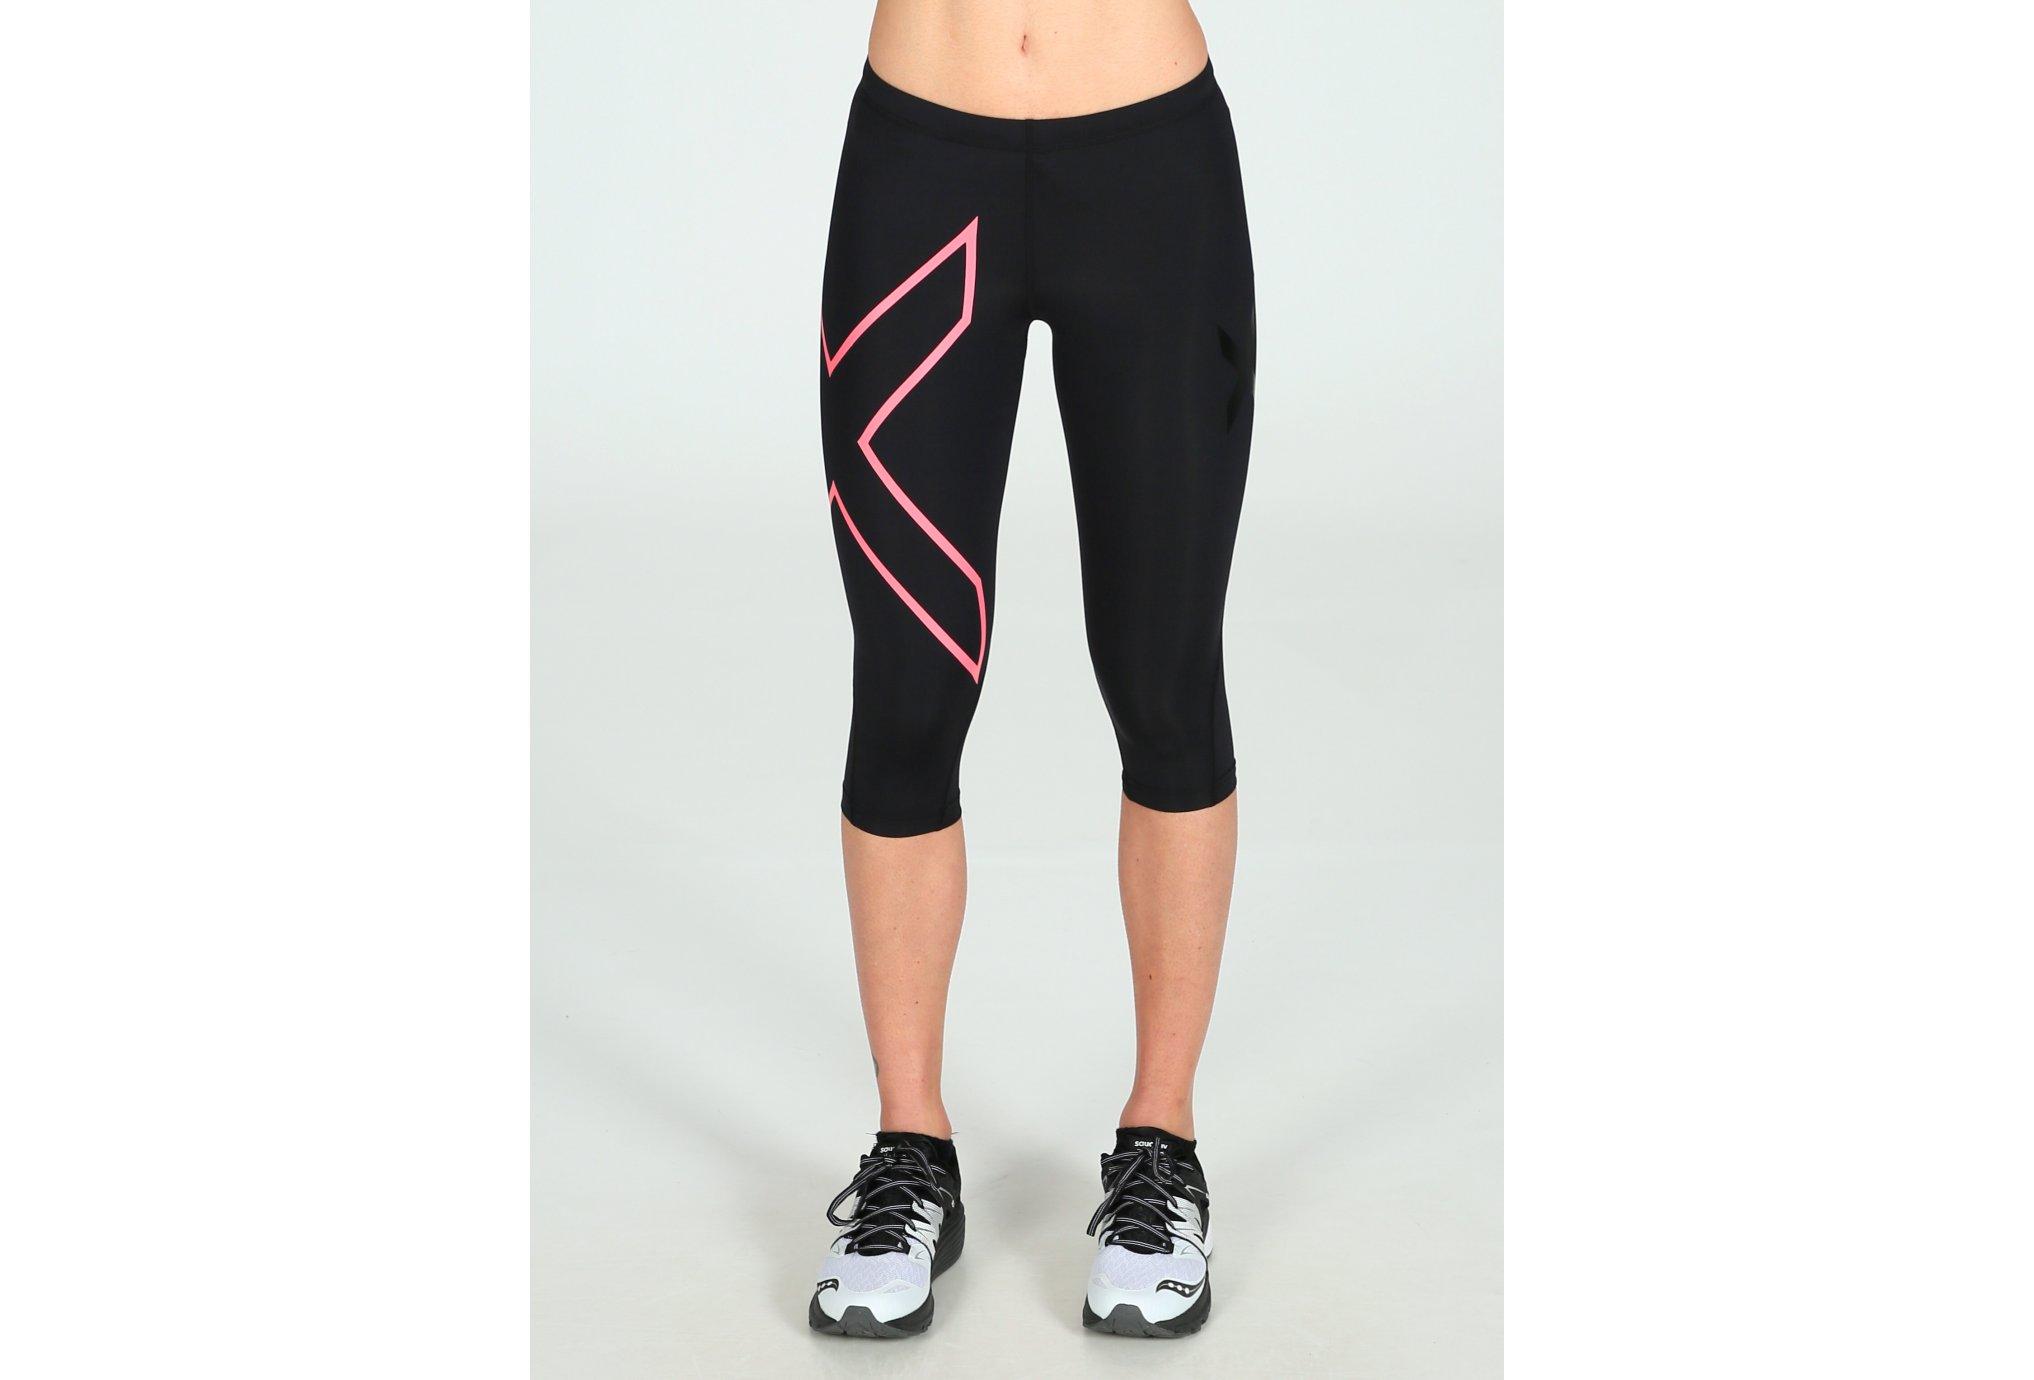 2xu Perform compression w vêtement running femme